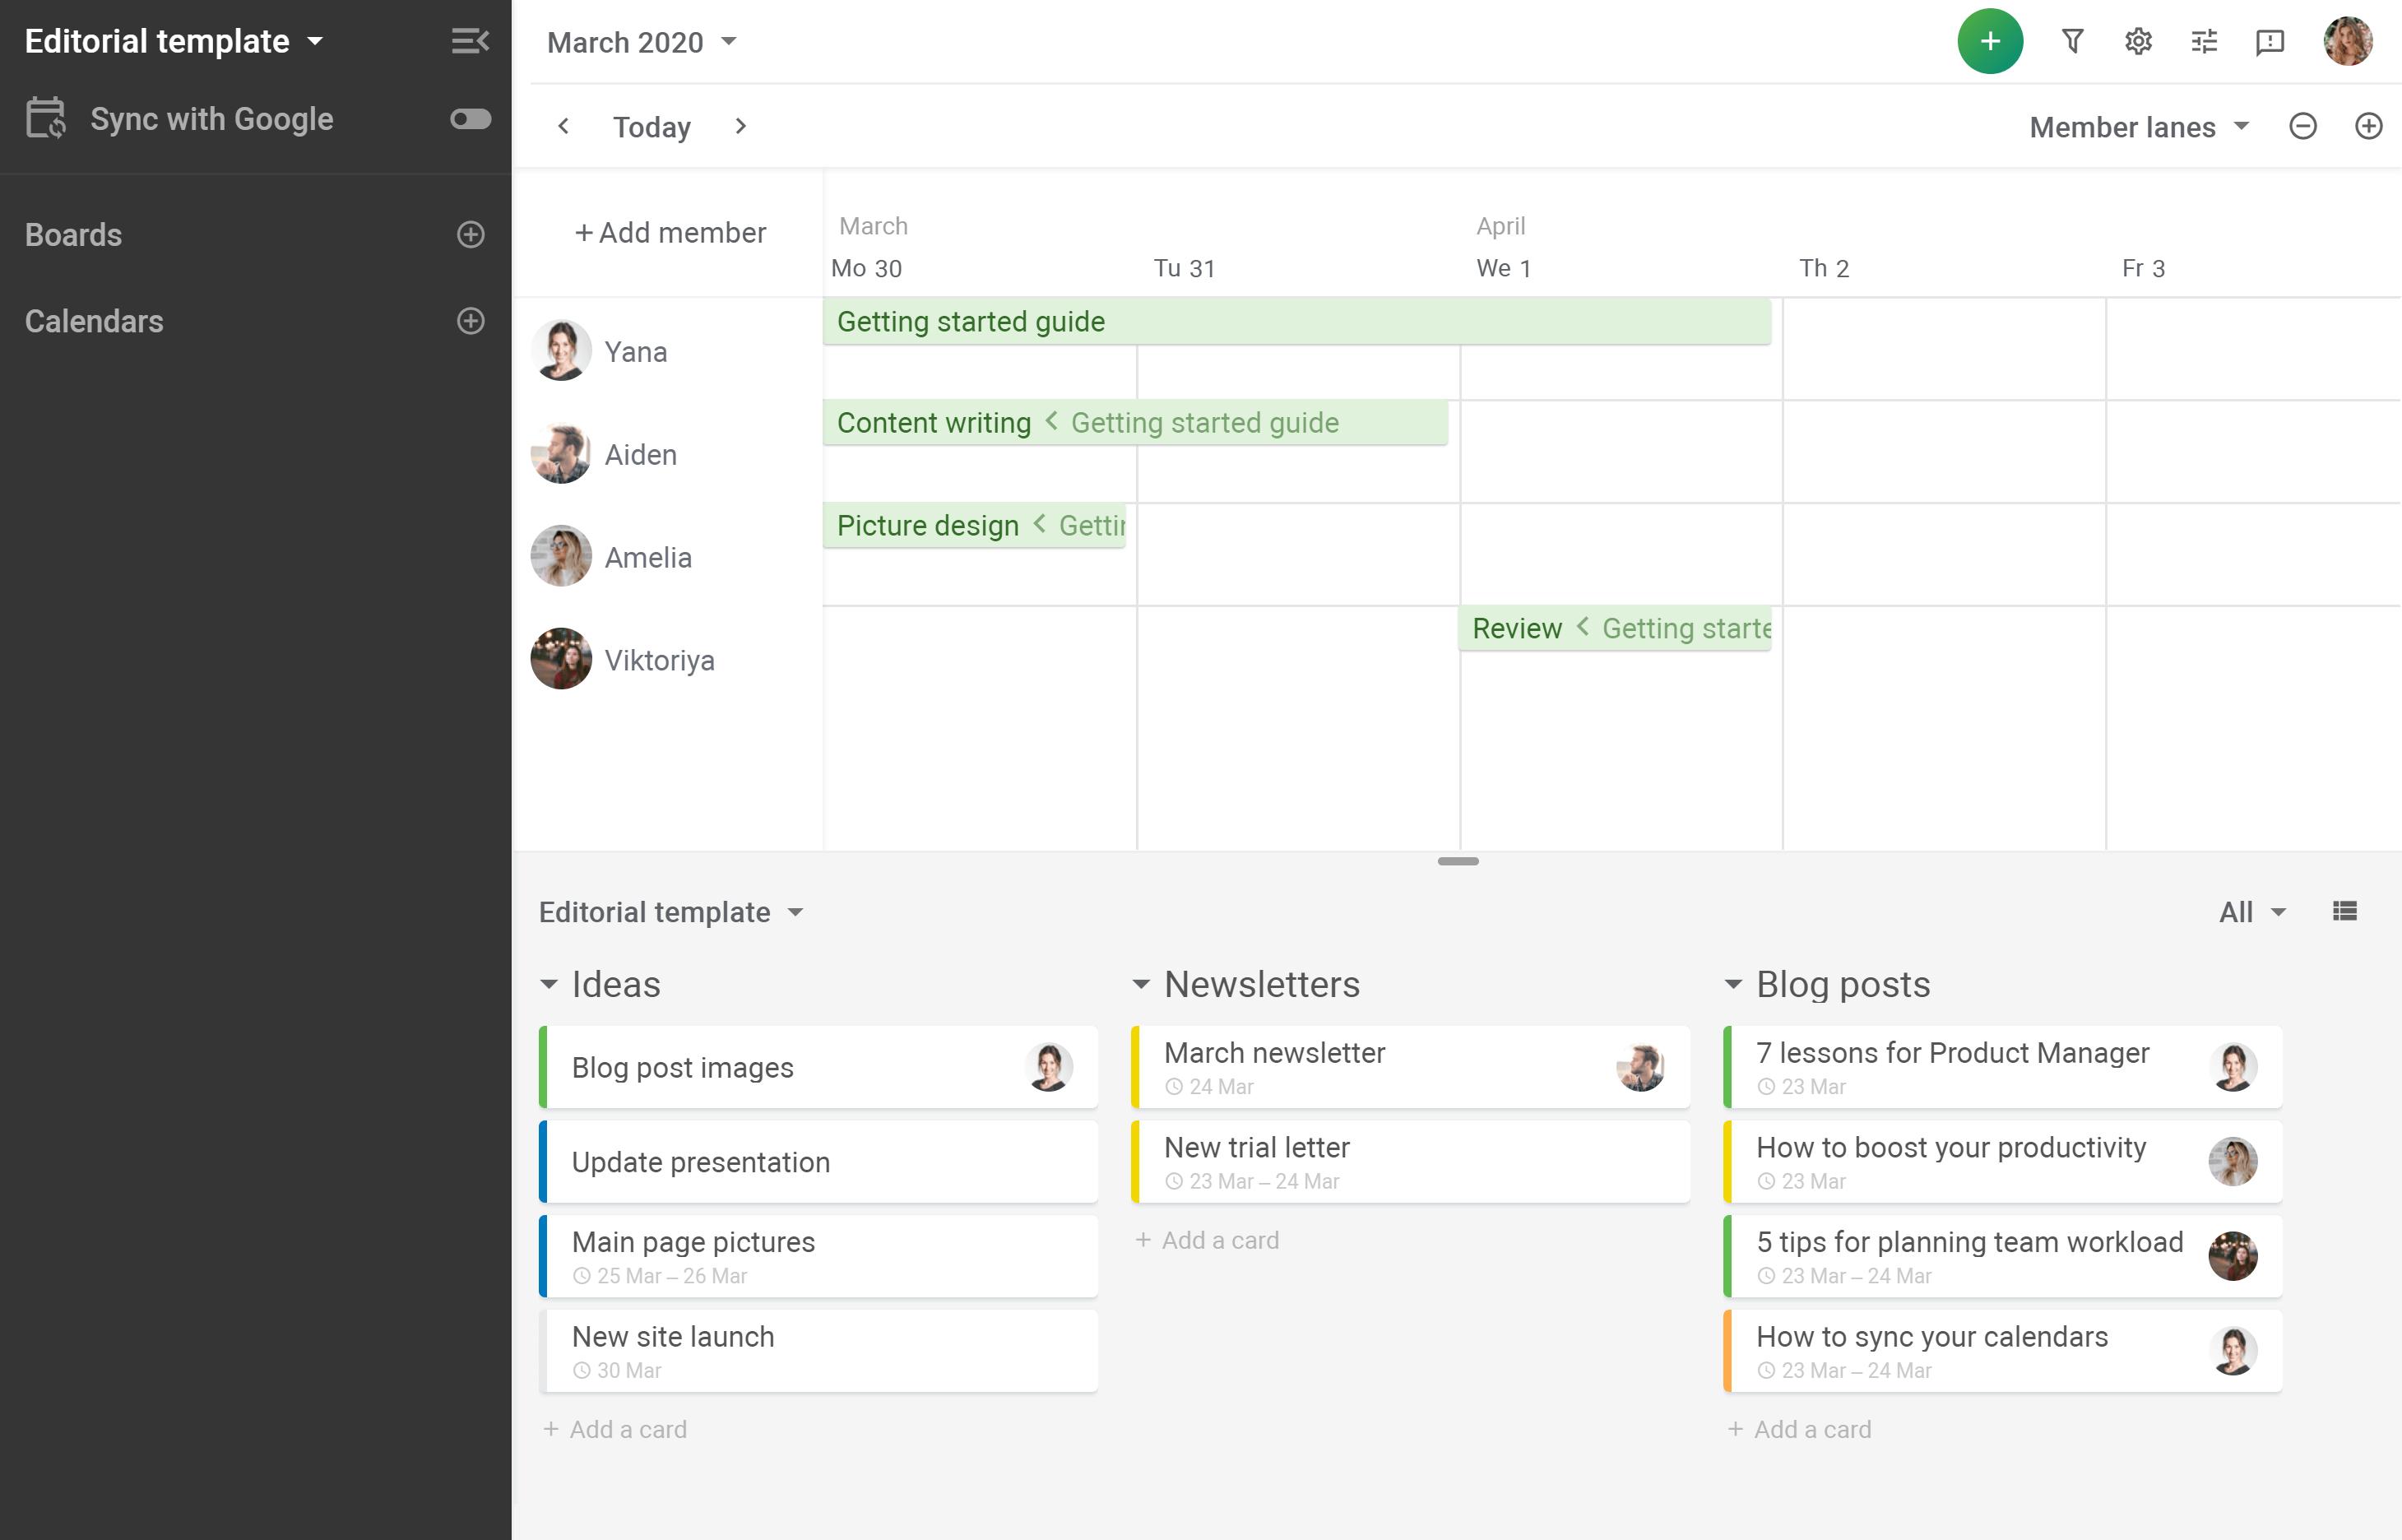 Planyway Schedule checklist items in calendar